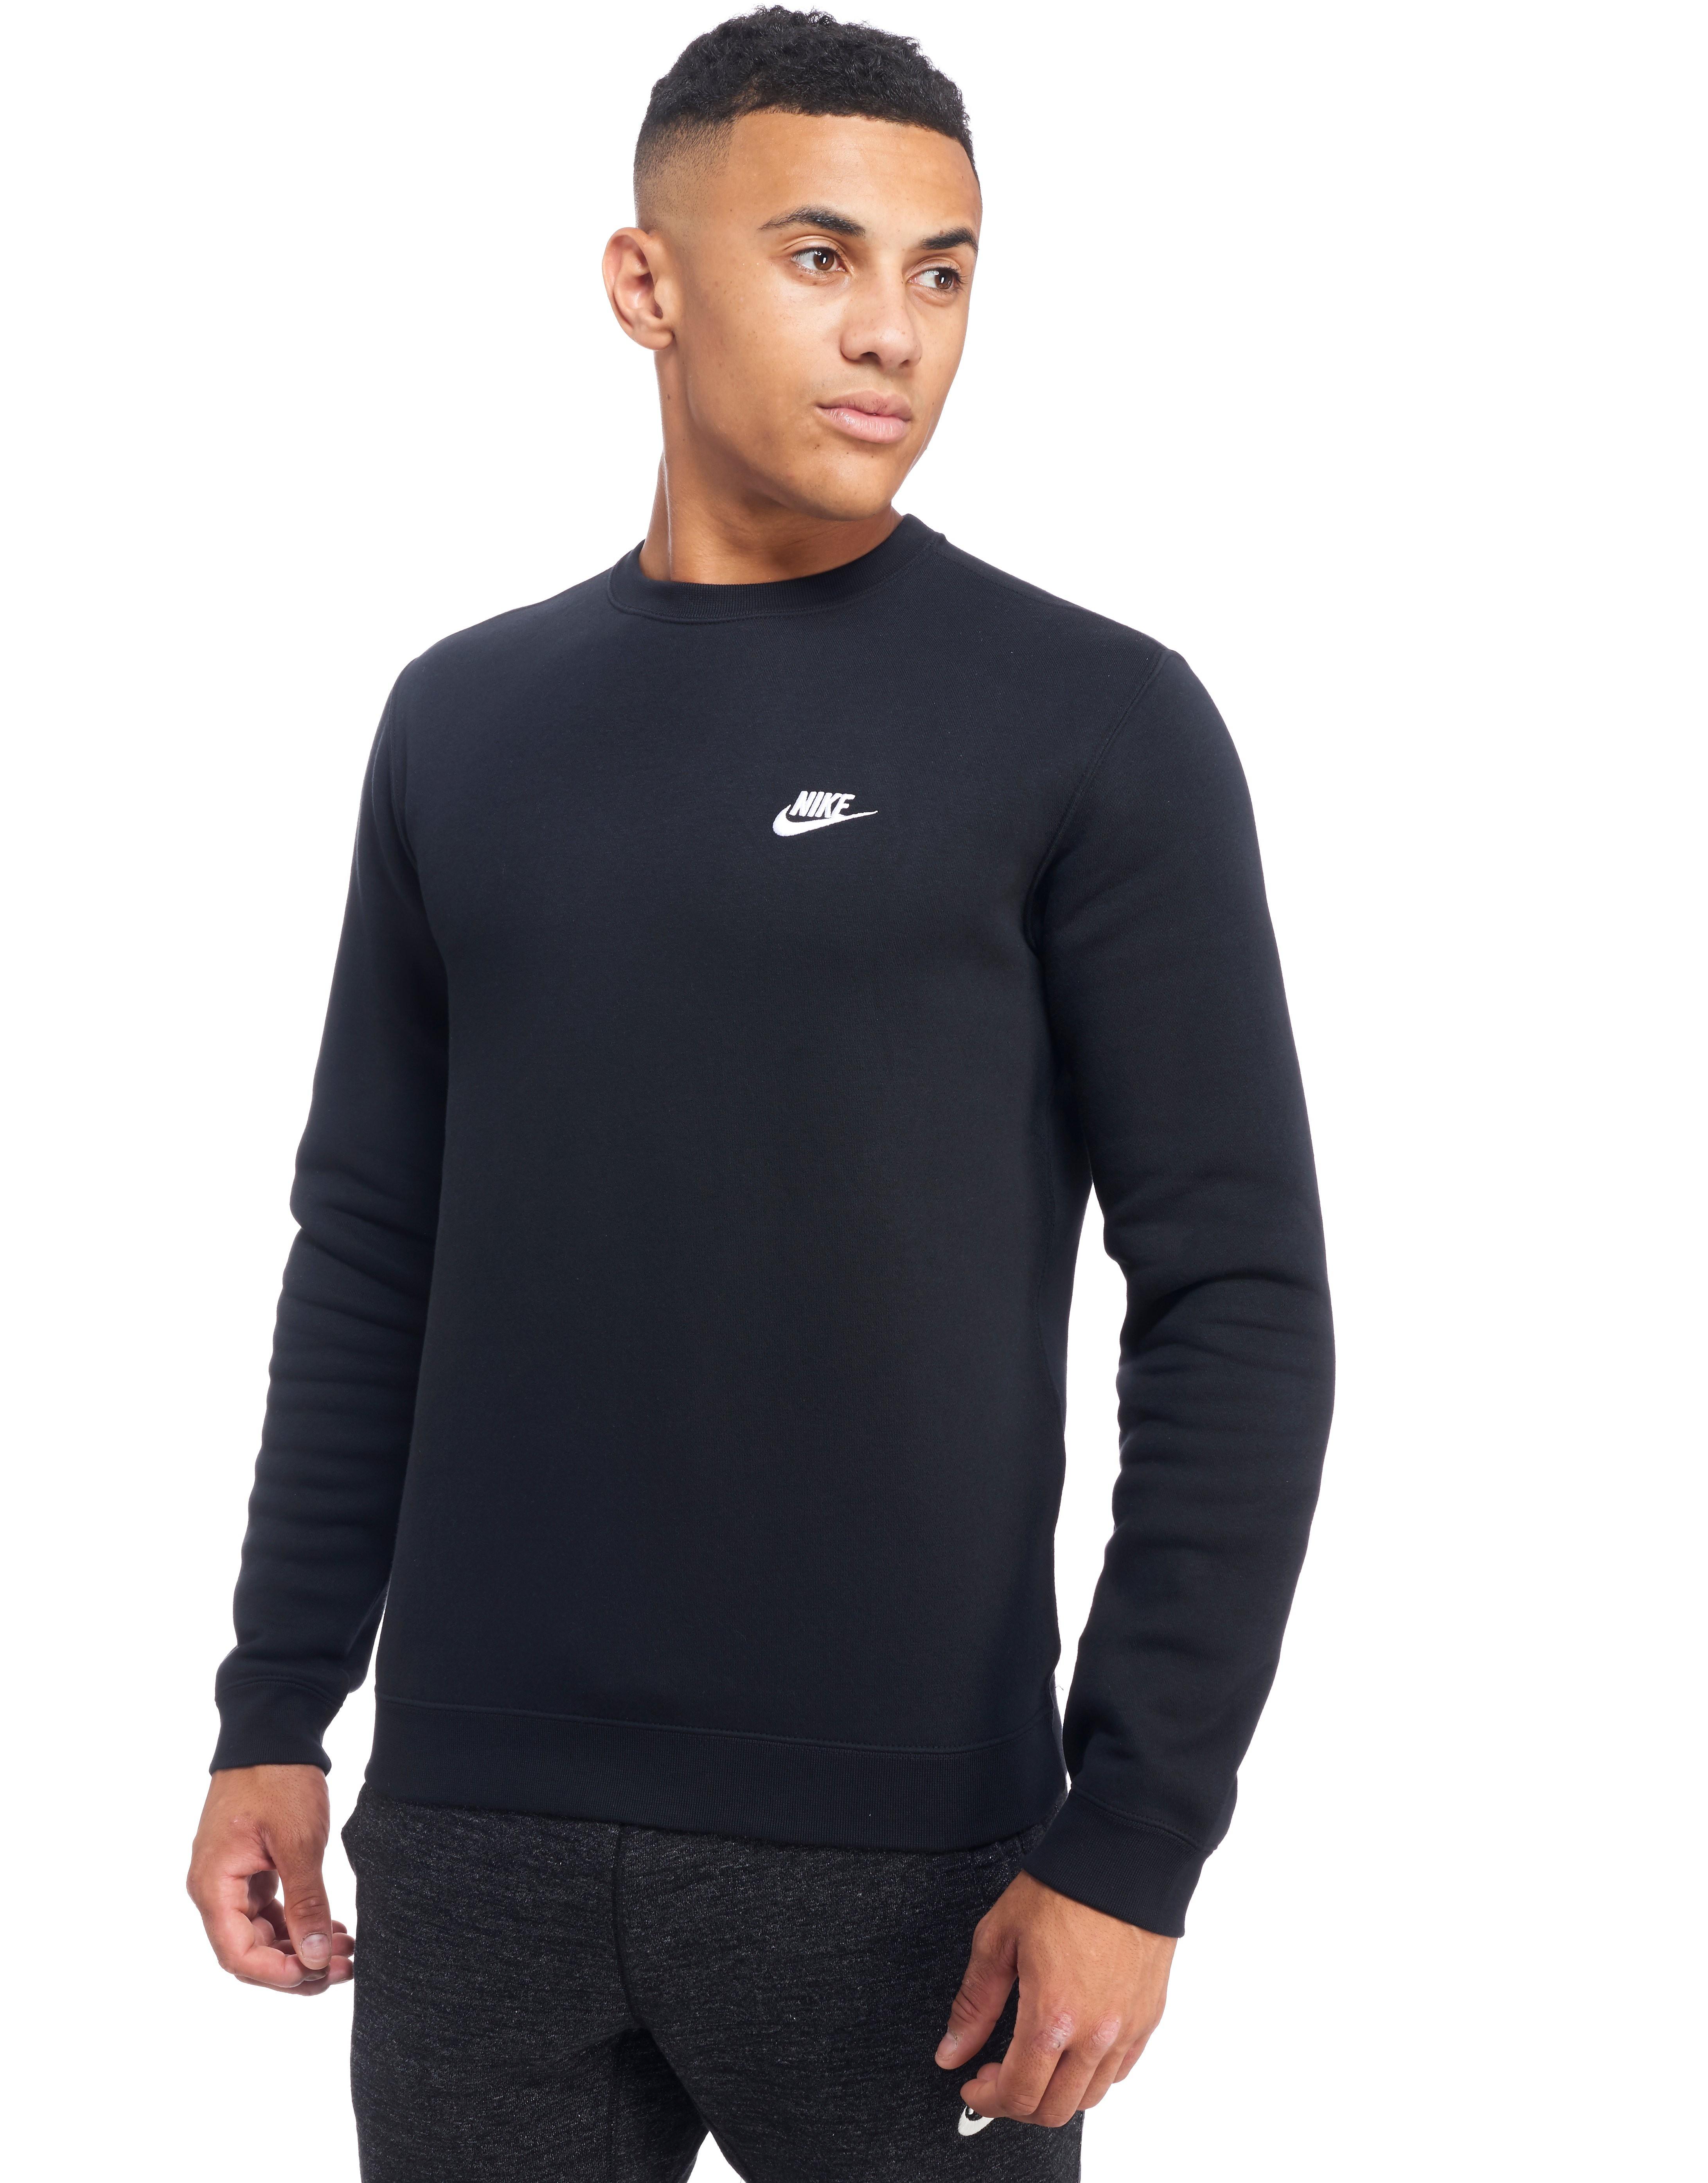 Nike Sweatshirt Foundation Crew